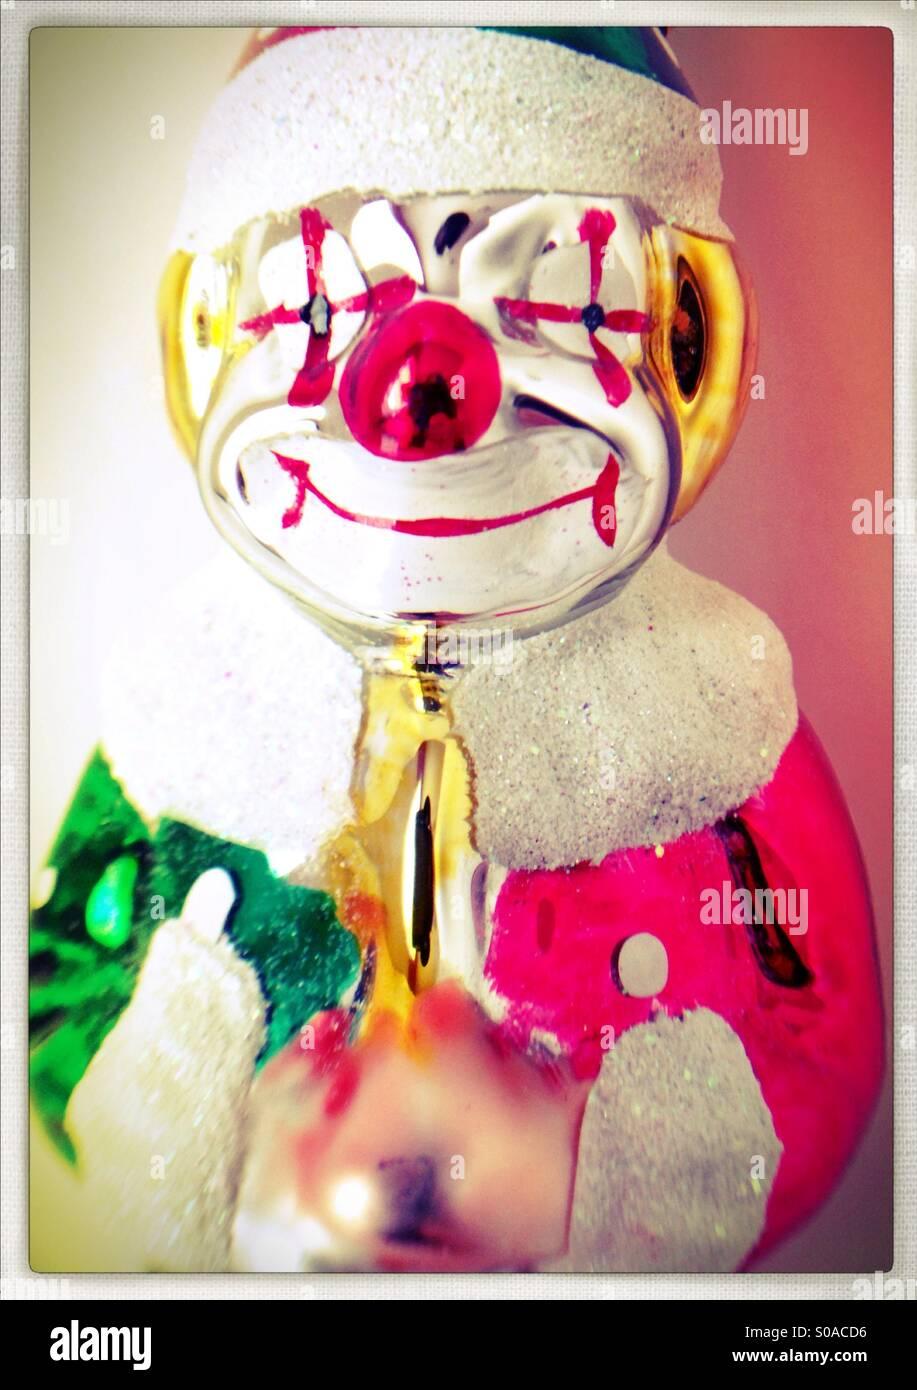 A shiny metal clown figurine. - Stock Image